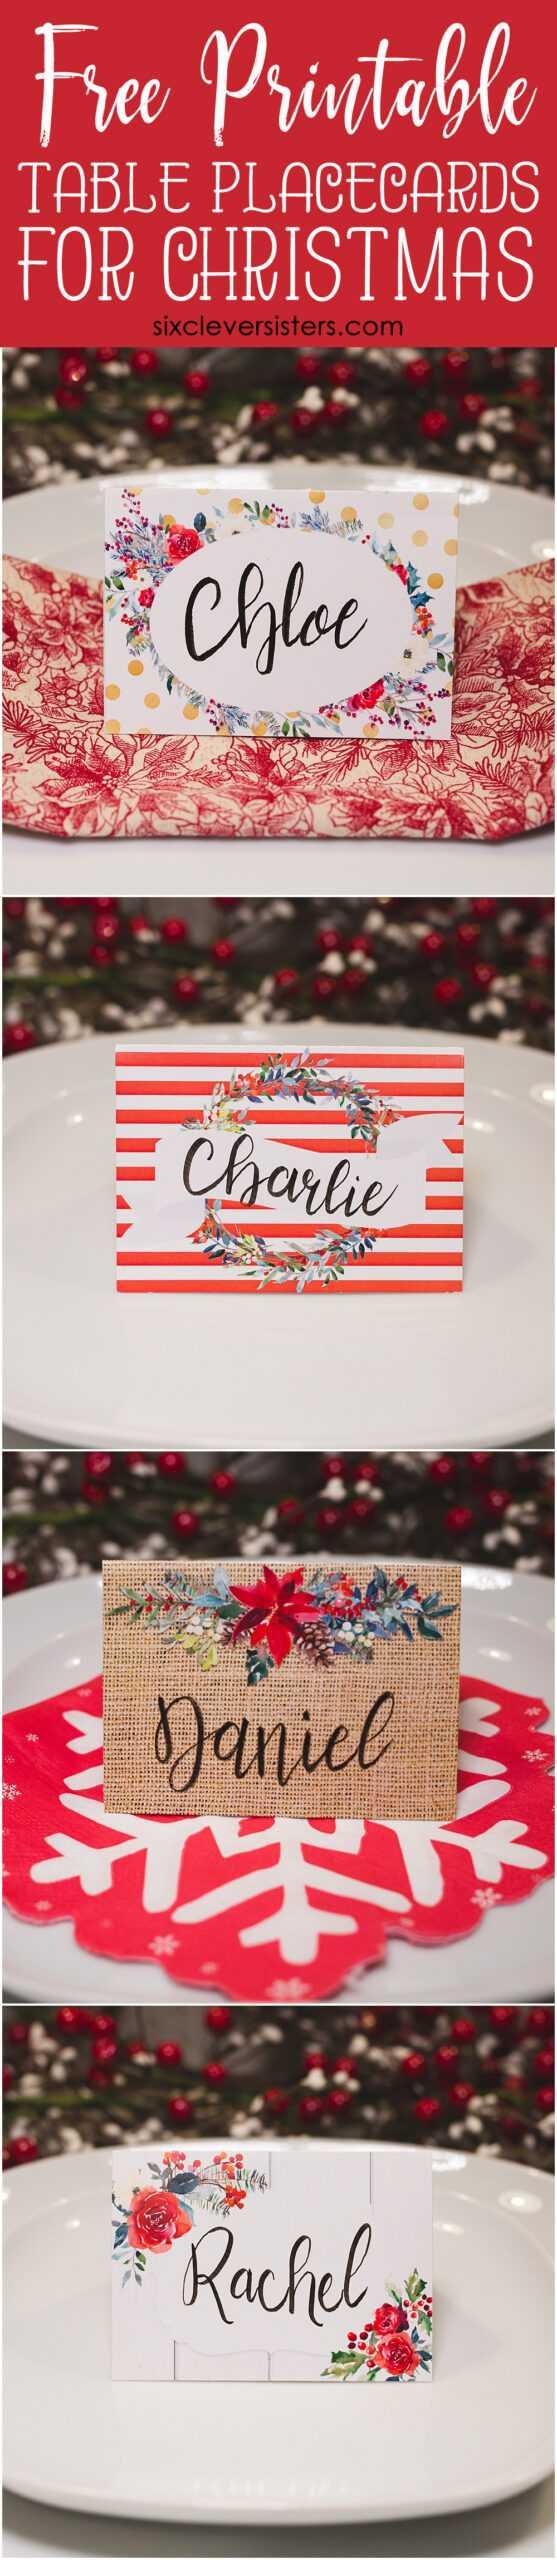 Christmas Table Place Cards { Free Printable} – Six Clever With Christmas Table Place Cards Template